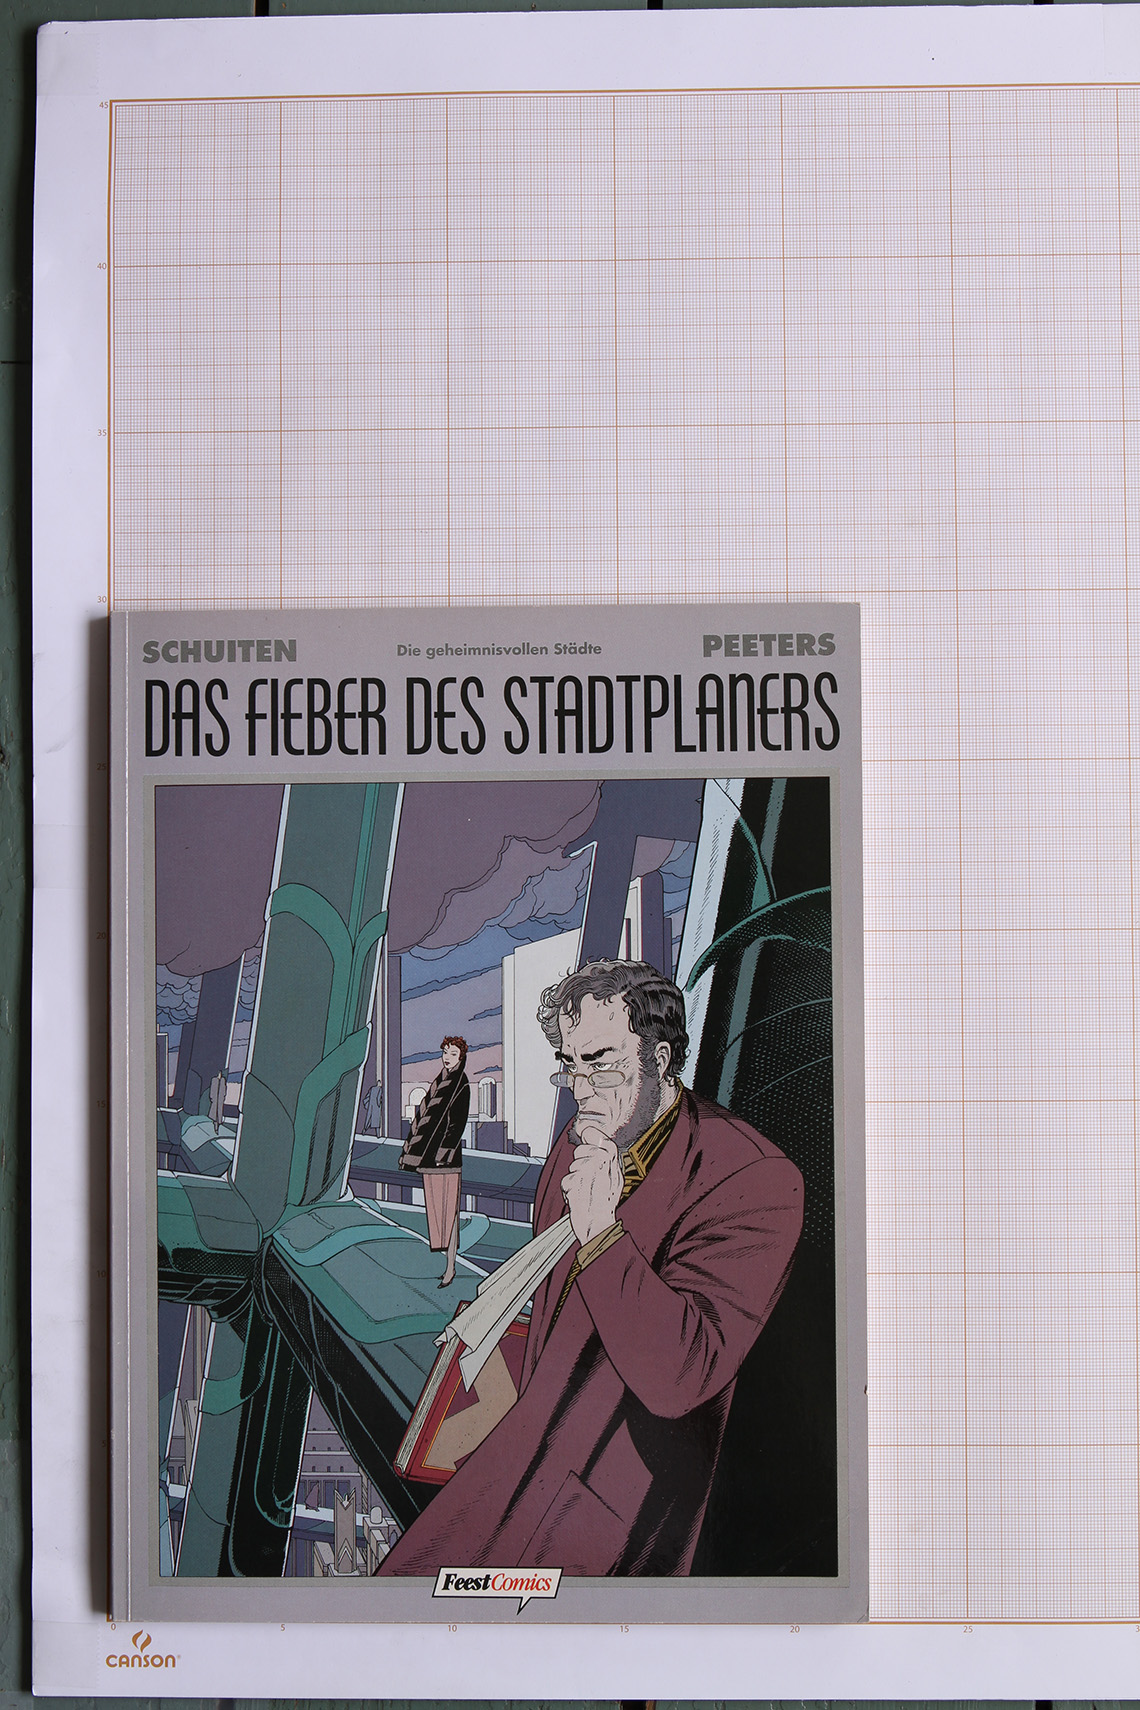 Das Fieber des Stadplaners, F.Schuiten & B.Peeters - Feest Comics© Maison Autrique, 1995